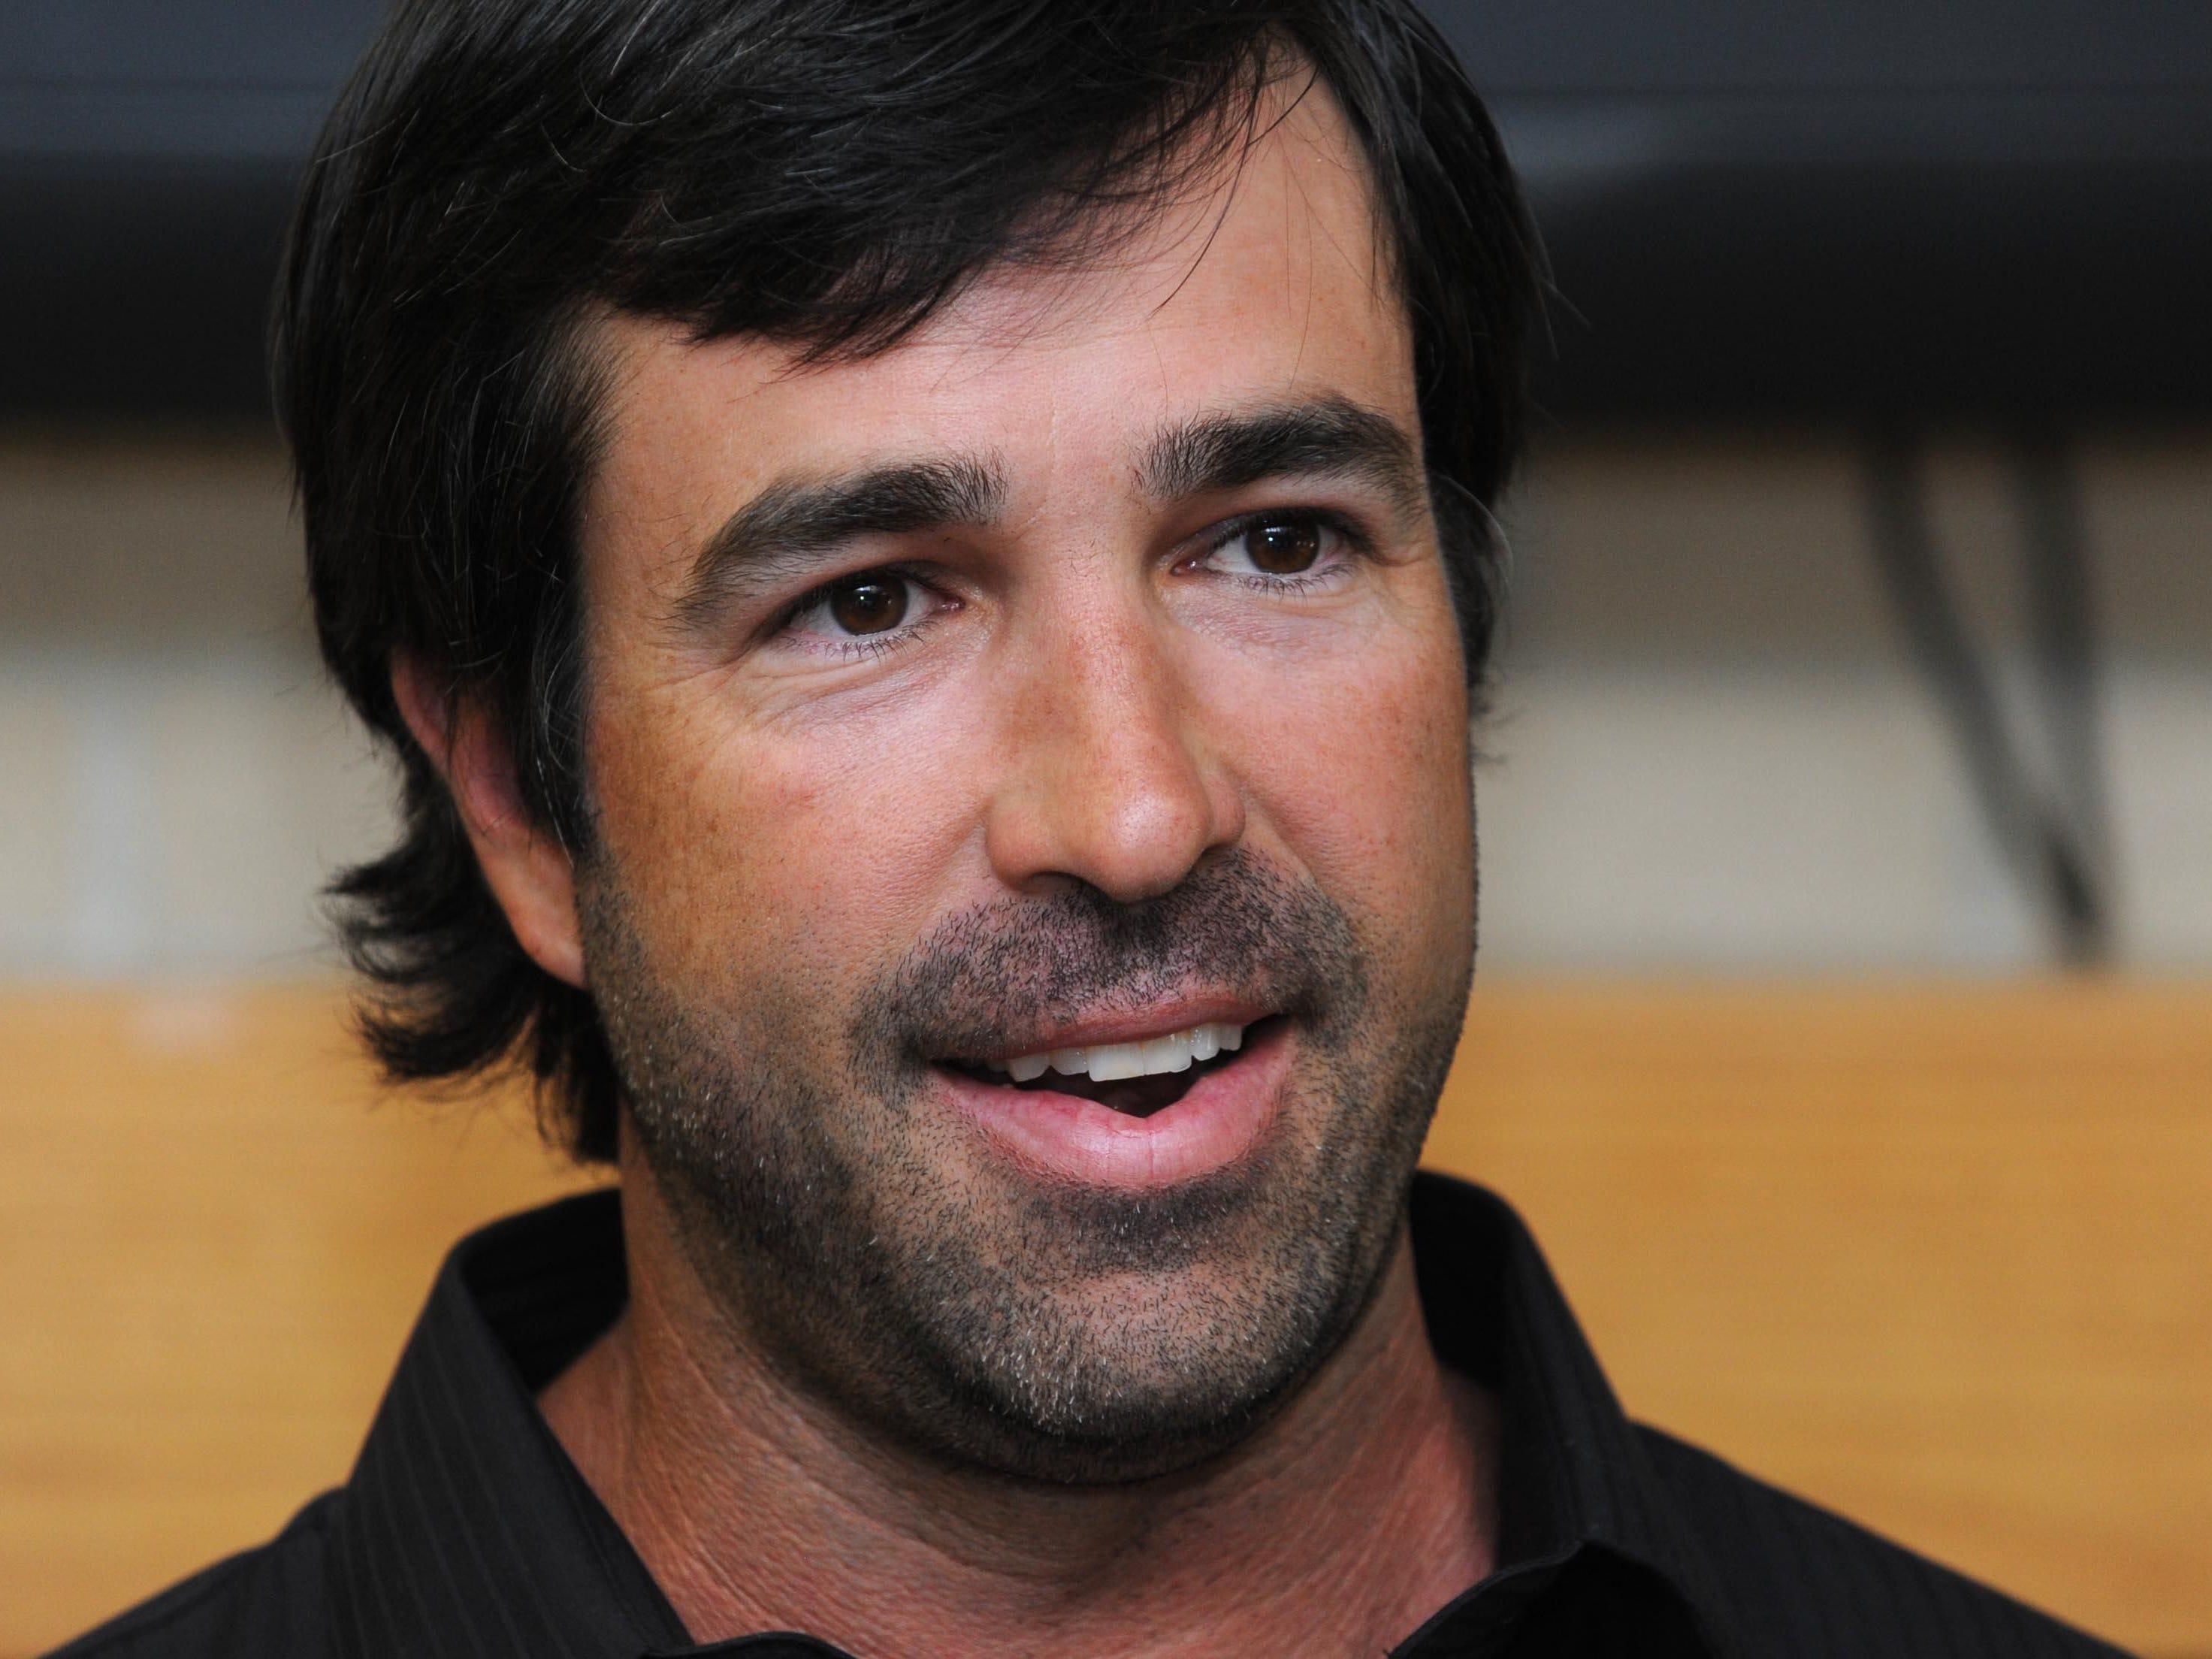 Todd Walker has resigned as the baseball coach at Calvary Baptist Academy.